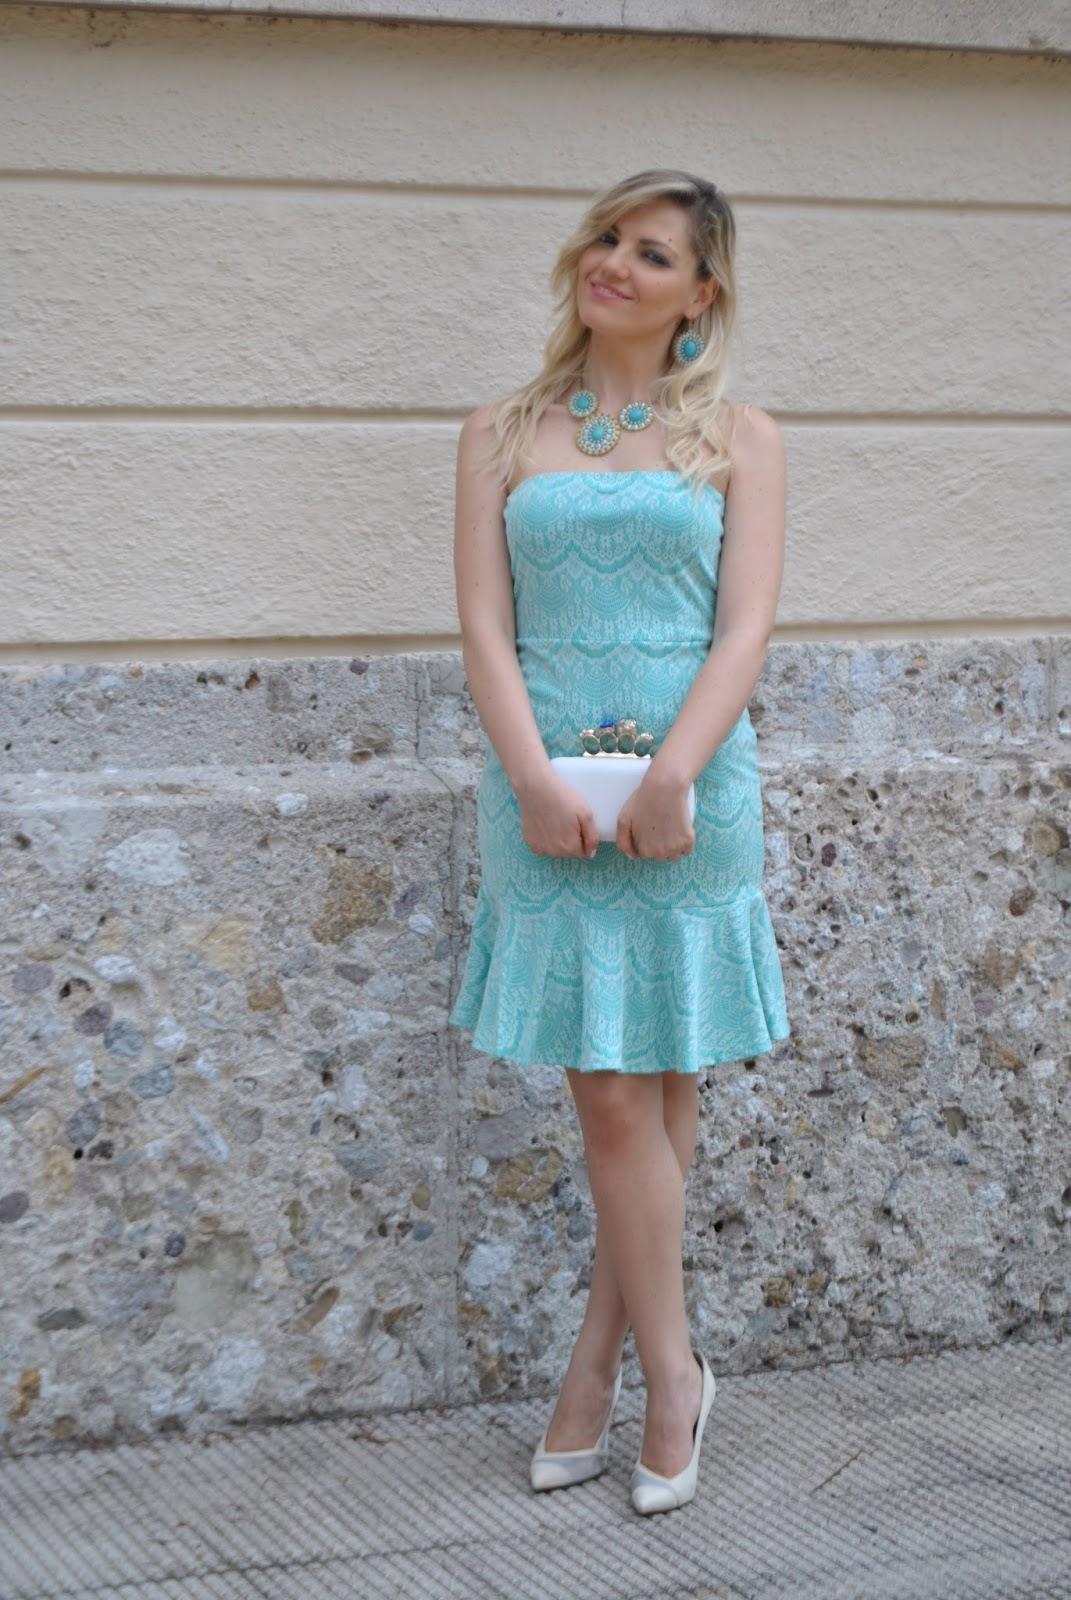 outfit abito verde acqua outfit verde come abbinare il verde abbinamenti verde  acqua abito di pizzo